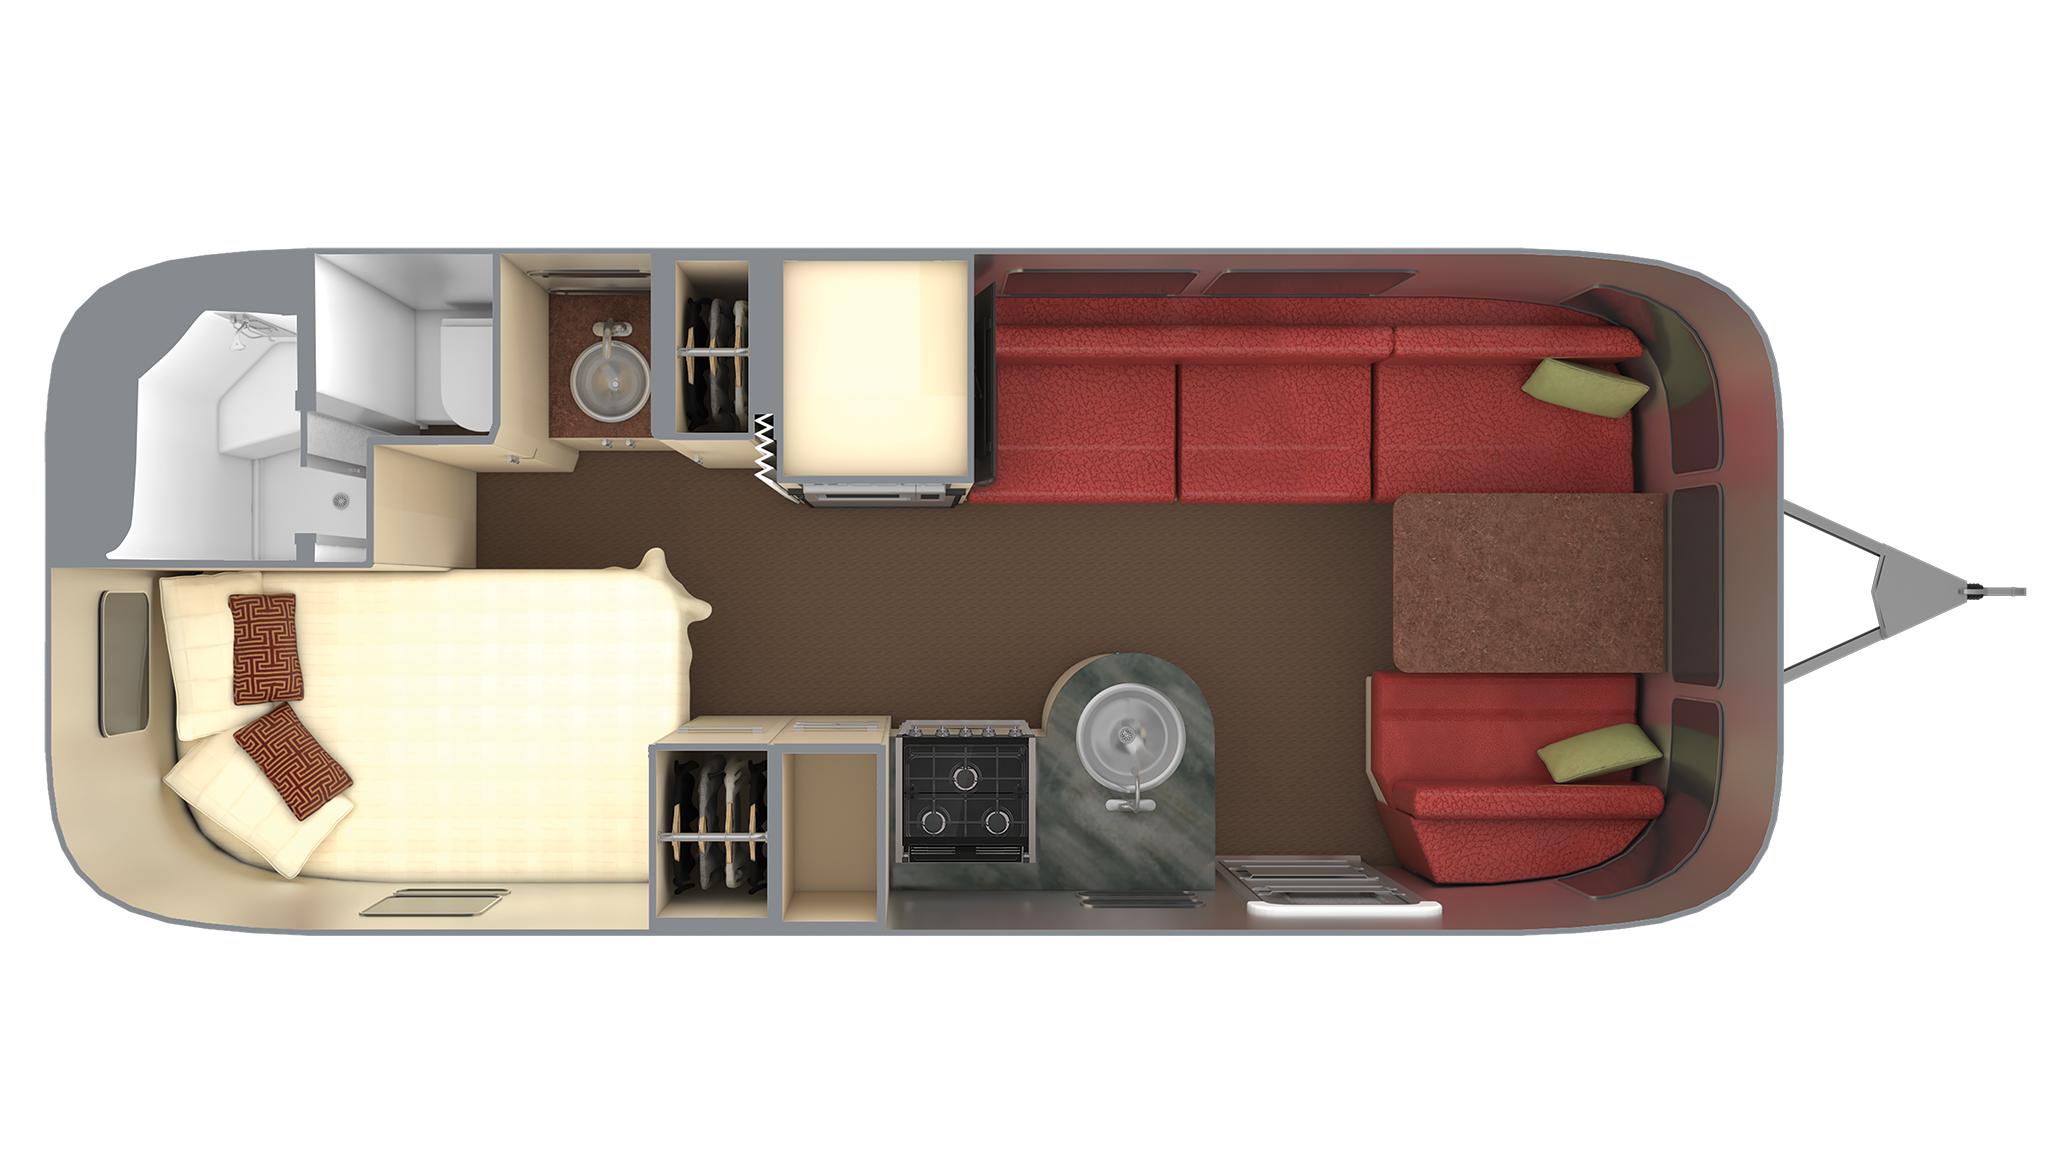 Airstream-Travel-Trailer-Floor-Plan-Naming-Corner-Bed